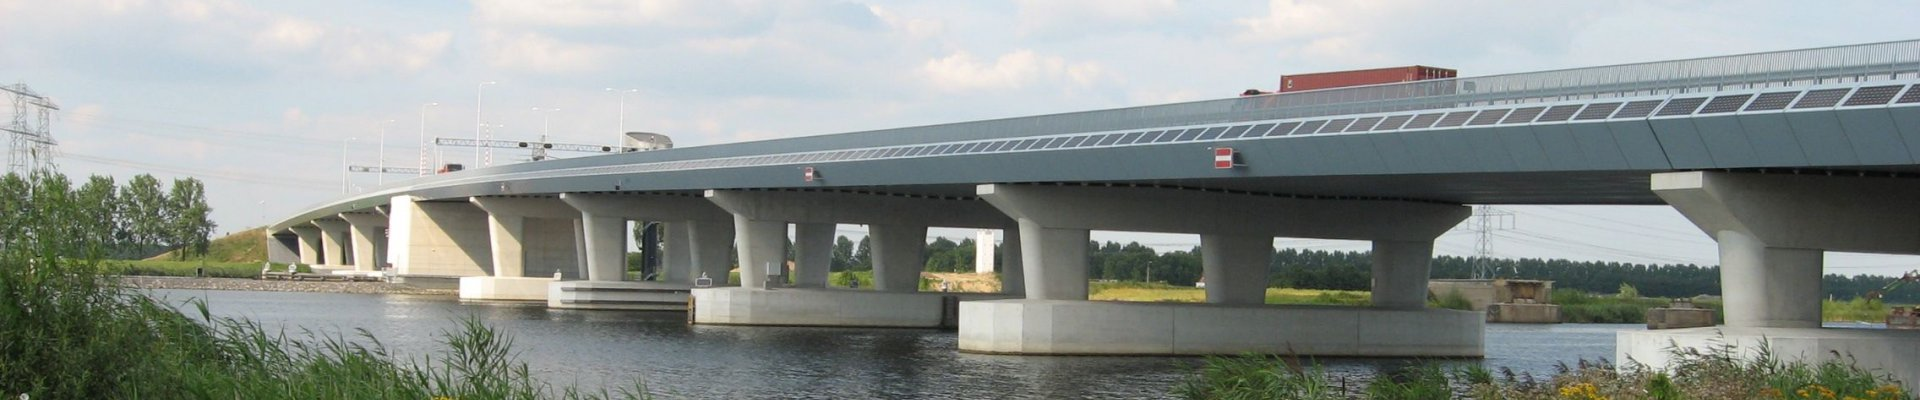 Brug-RHE-Ramspol-0011920x400-2